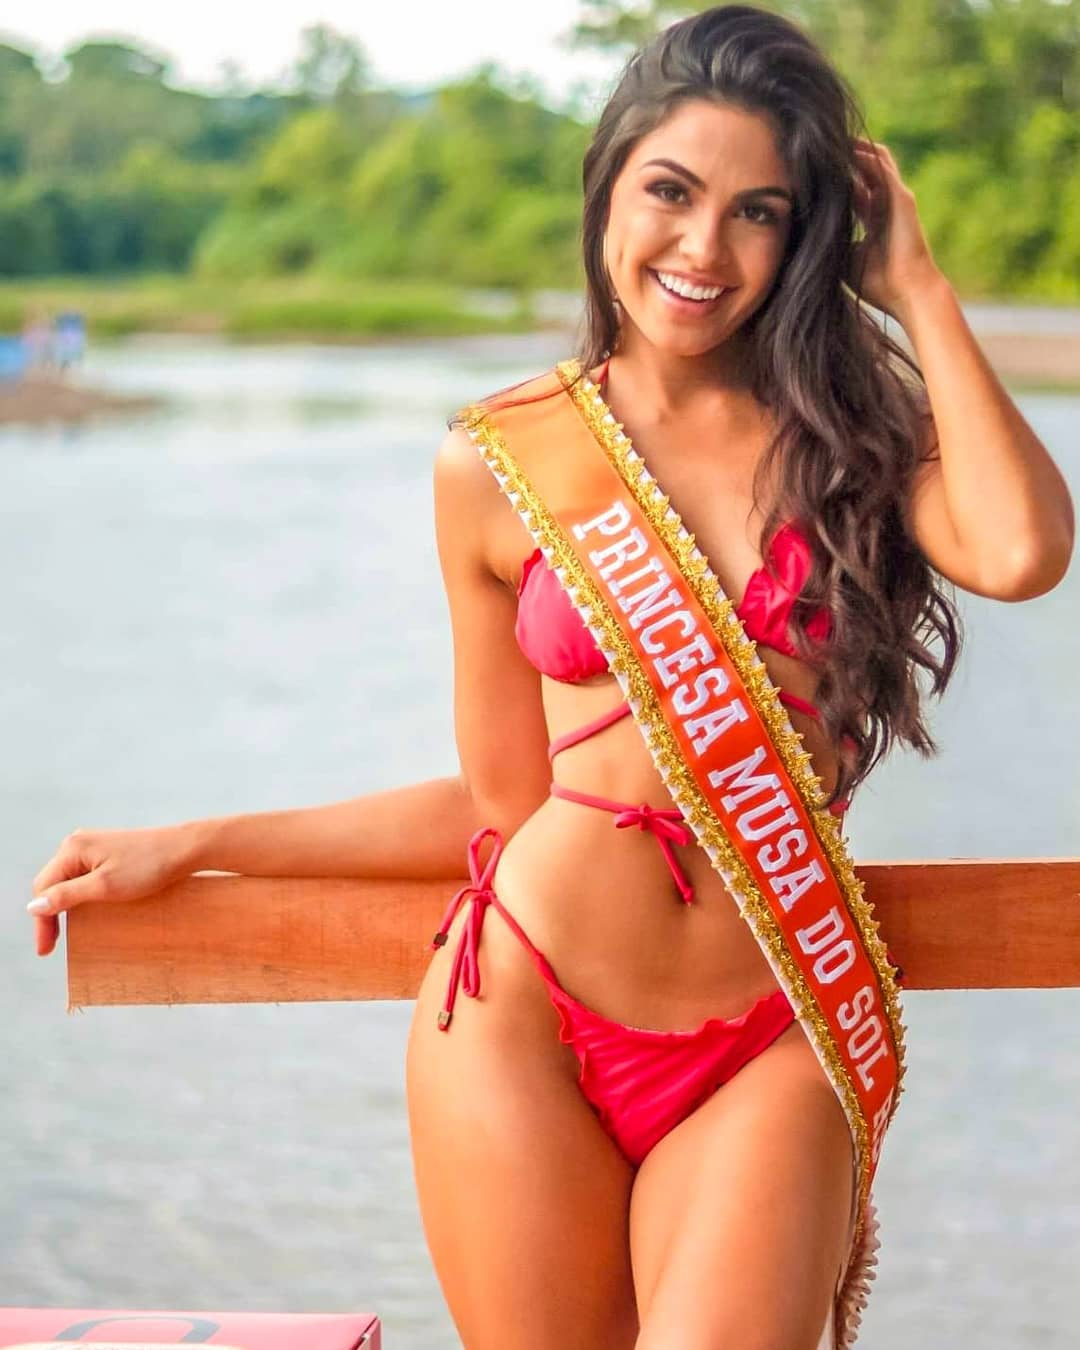 amanda brenner, miss hispanoamericana brasil 2019/top 2 de miss grand brasil 2019/top 2 de rainha da pecuaria internacional 2018. - Página 3 Unm7hx10